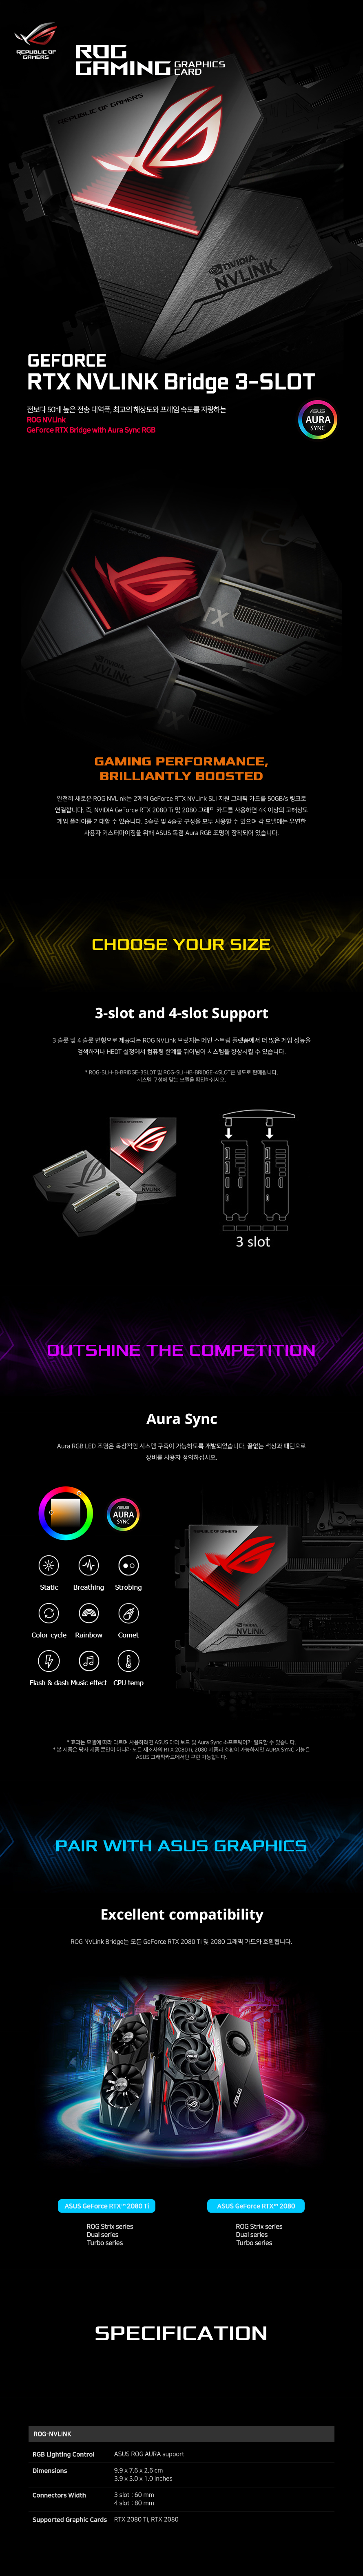 ASUS ROG STRIX NV링크 브릿지 3-Slot